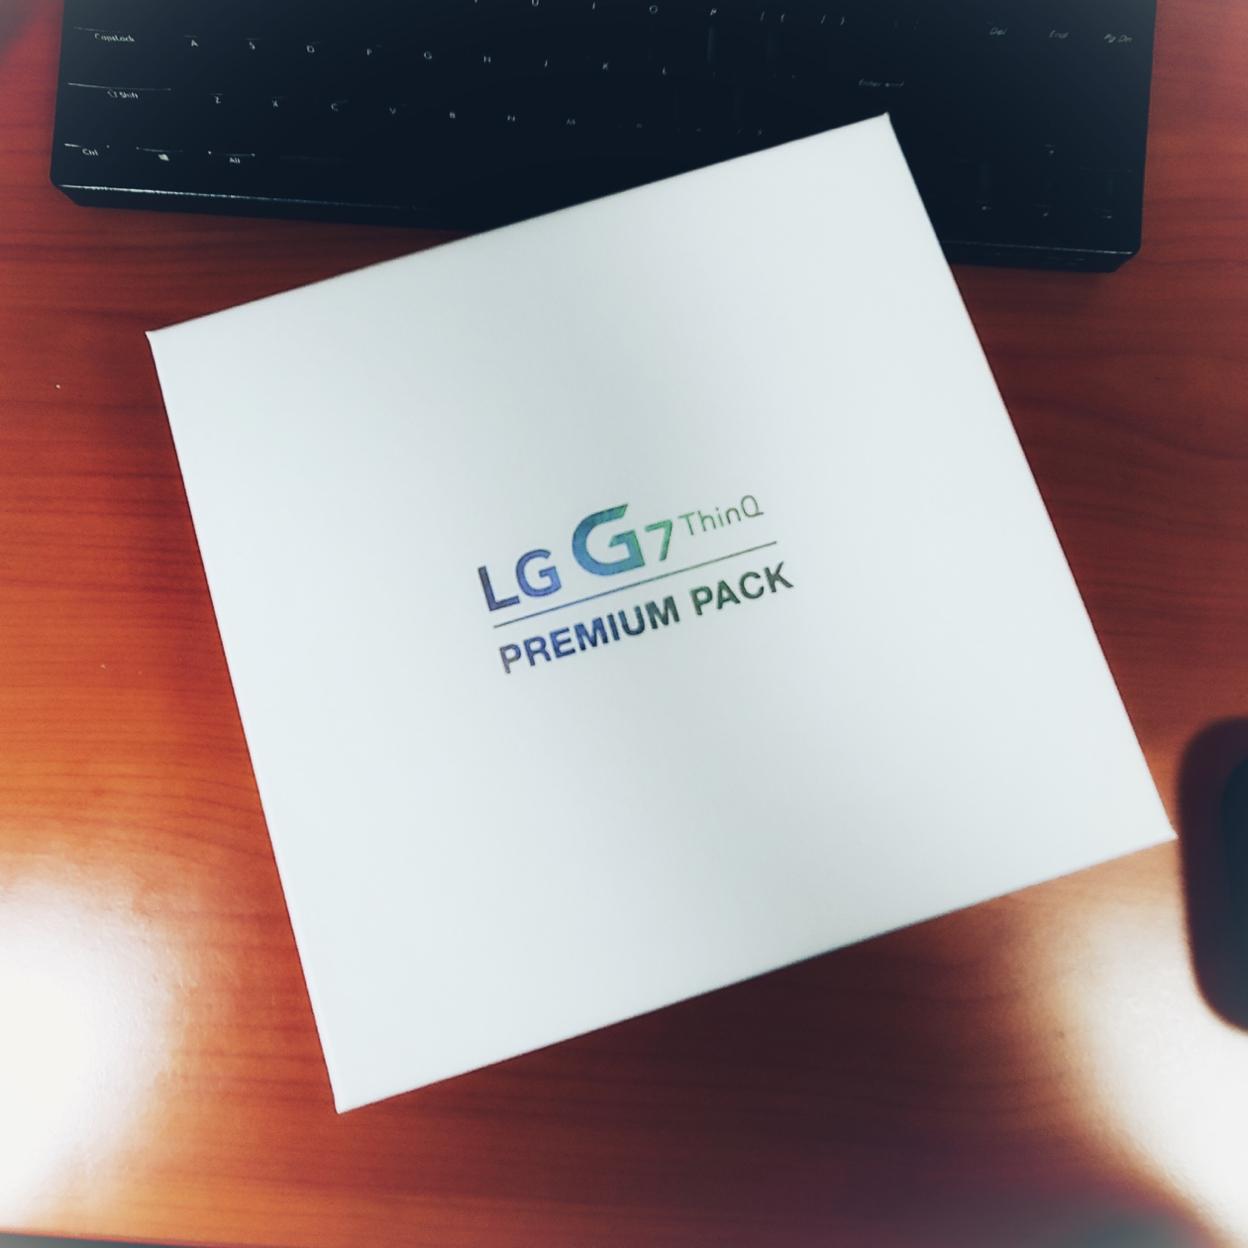 LG G7, 프리미엄 기프트팩 도착